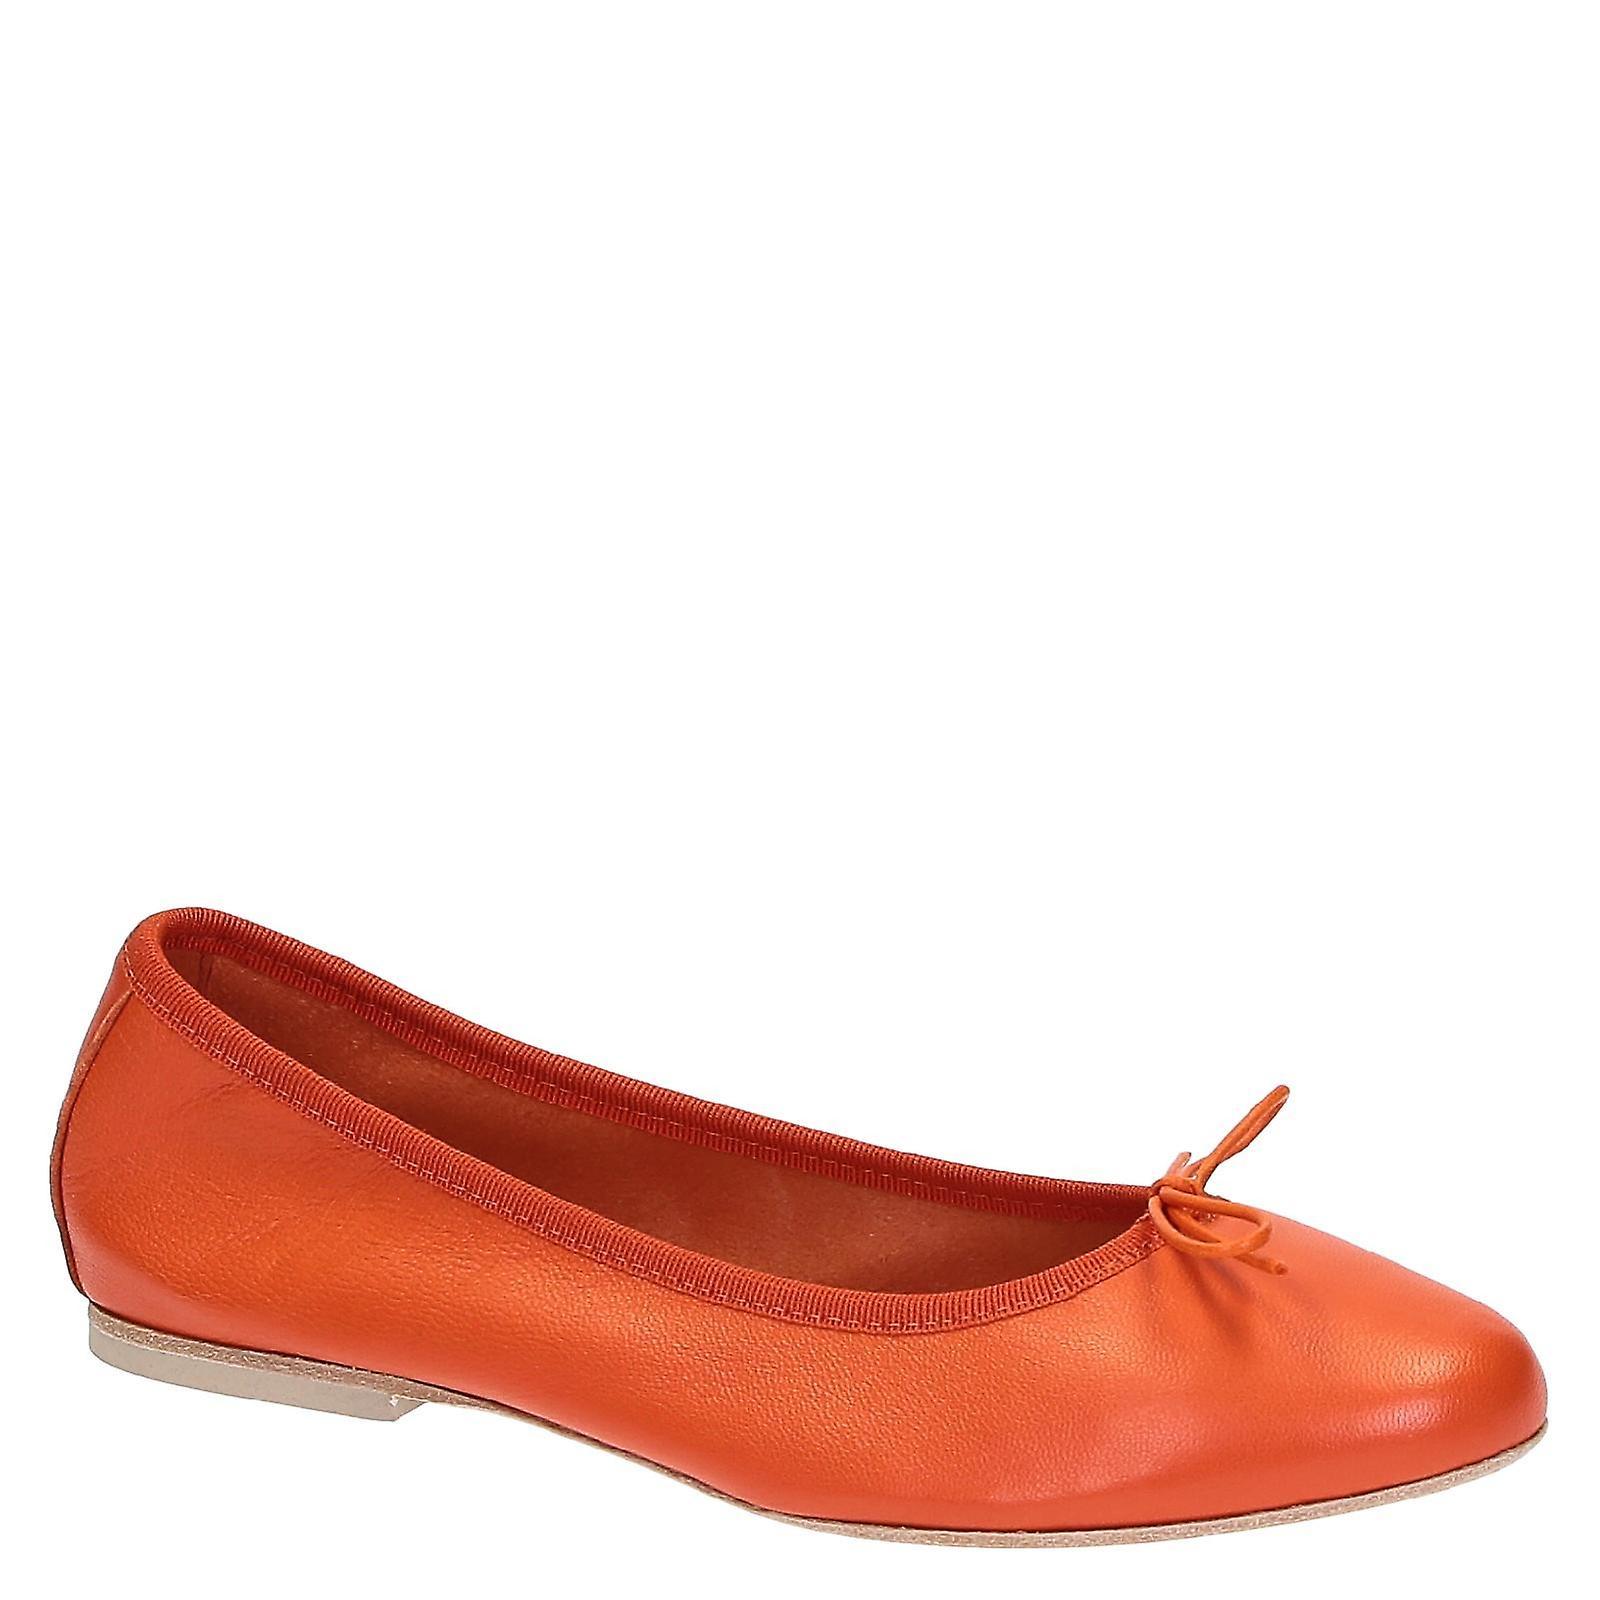 Handmade Orange soft leather ballet flats ballerinas chaussures